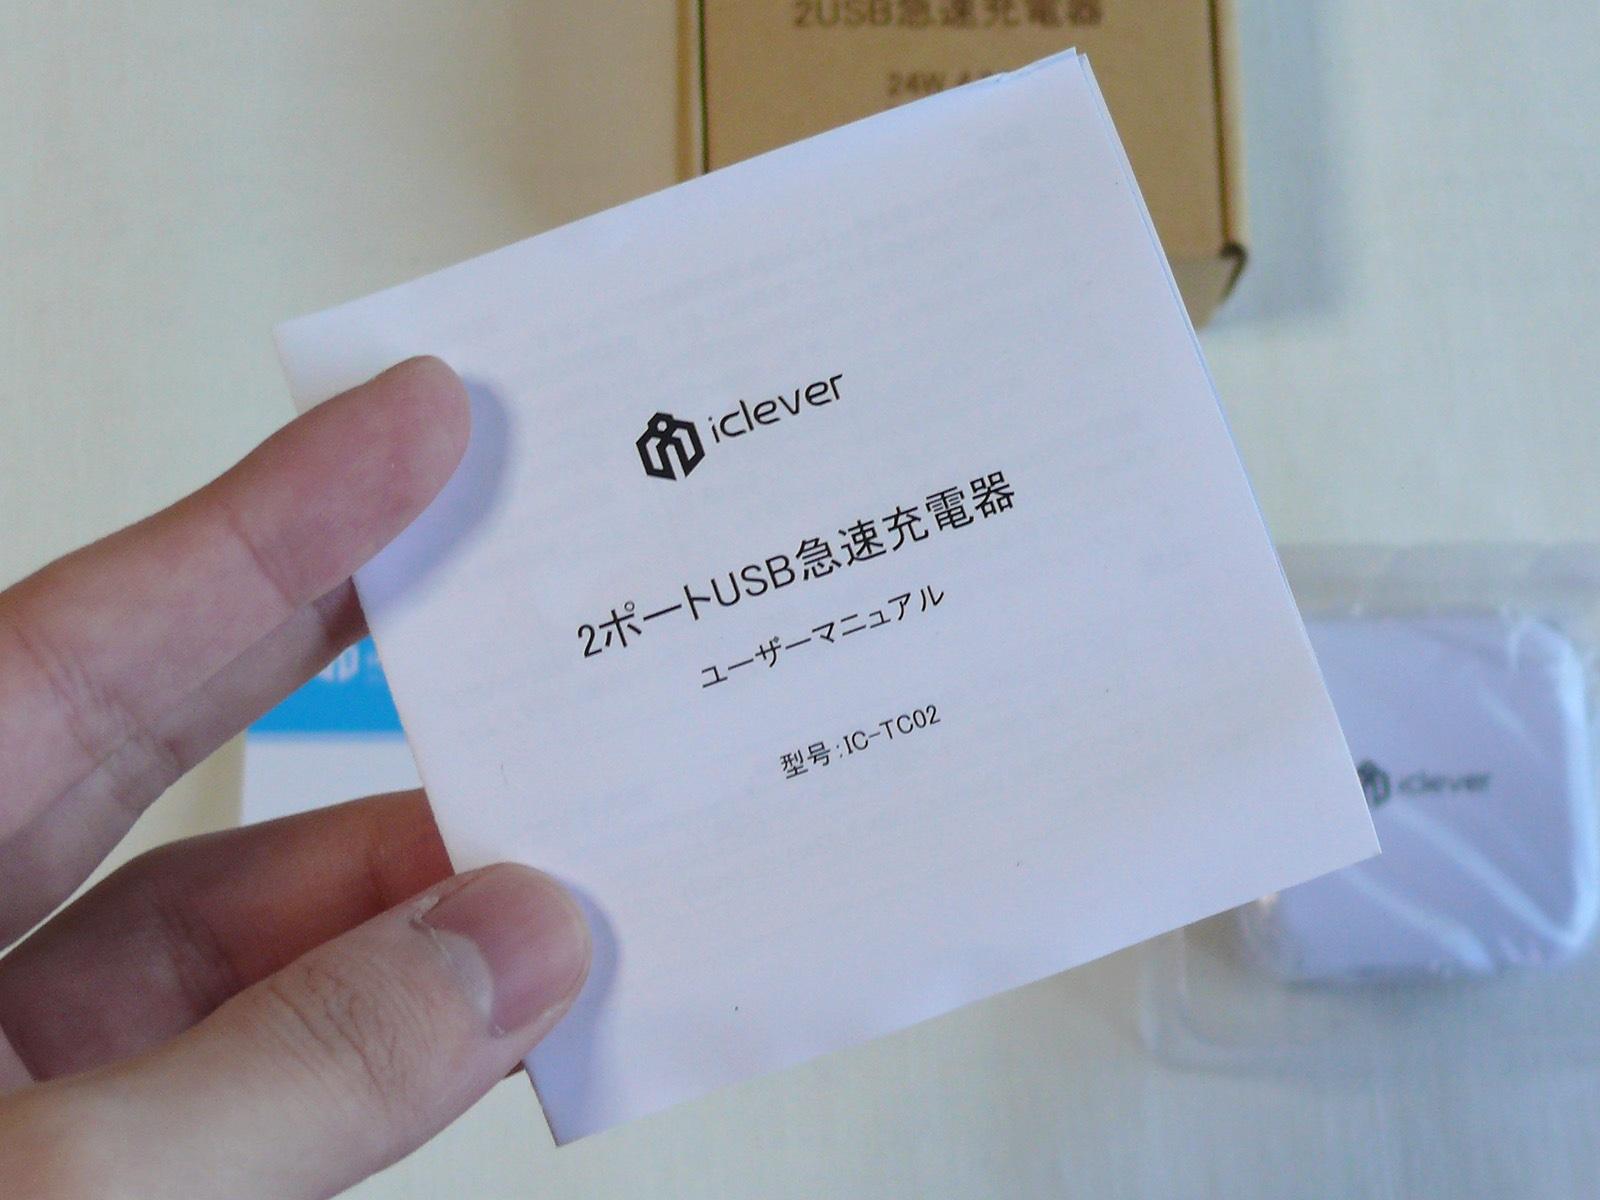 iClever USB充電器 開封 ユーザーマニュアル